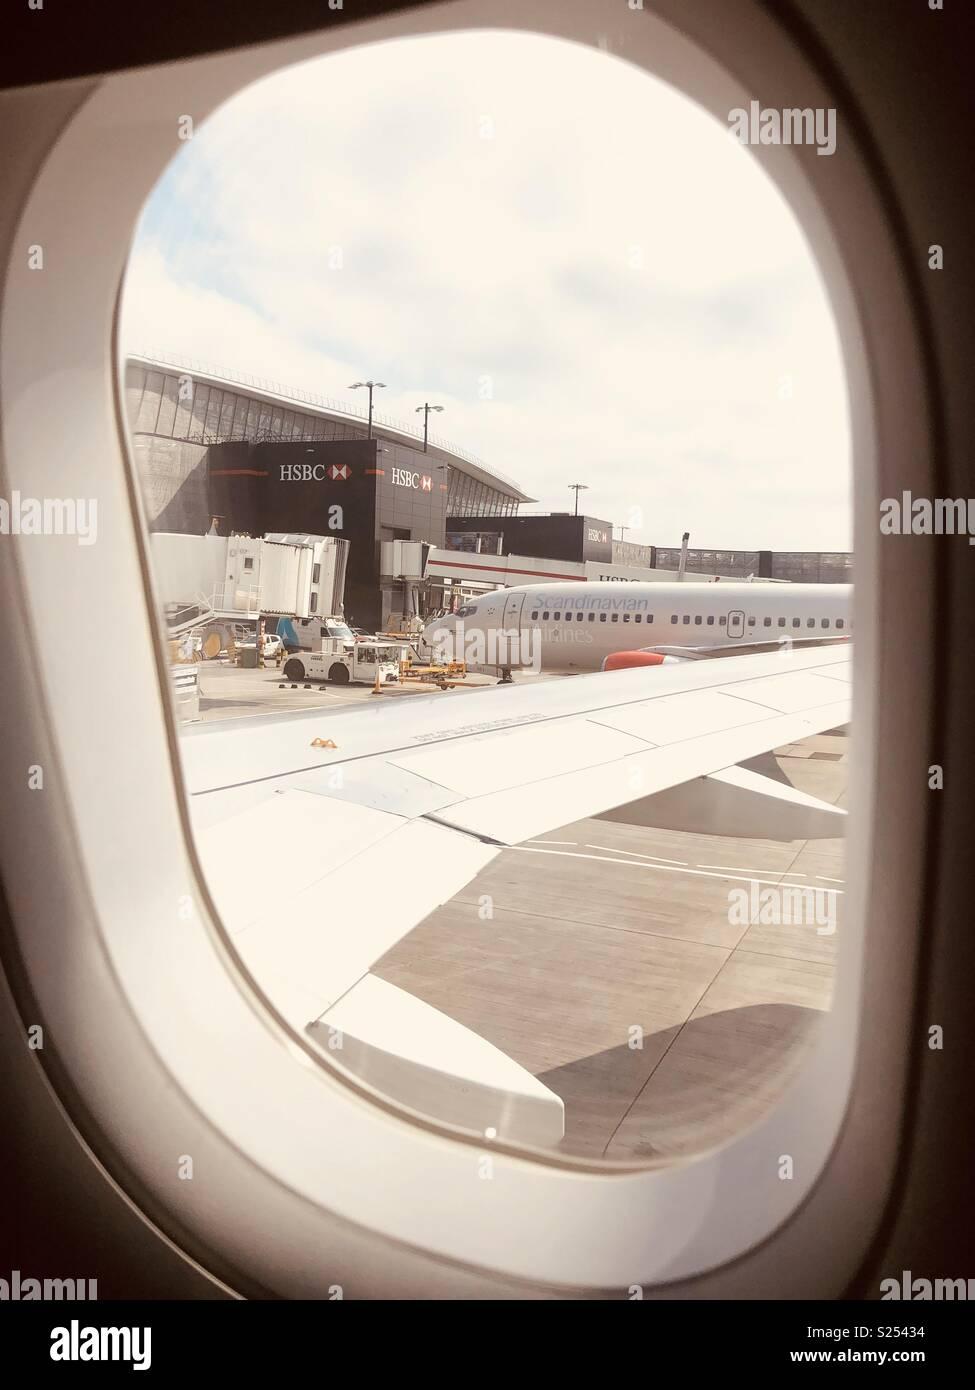 View of Heathrow runway outside of an aeroplane window - Stock Image